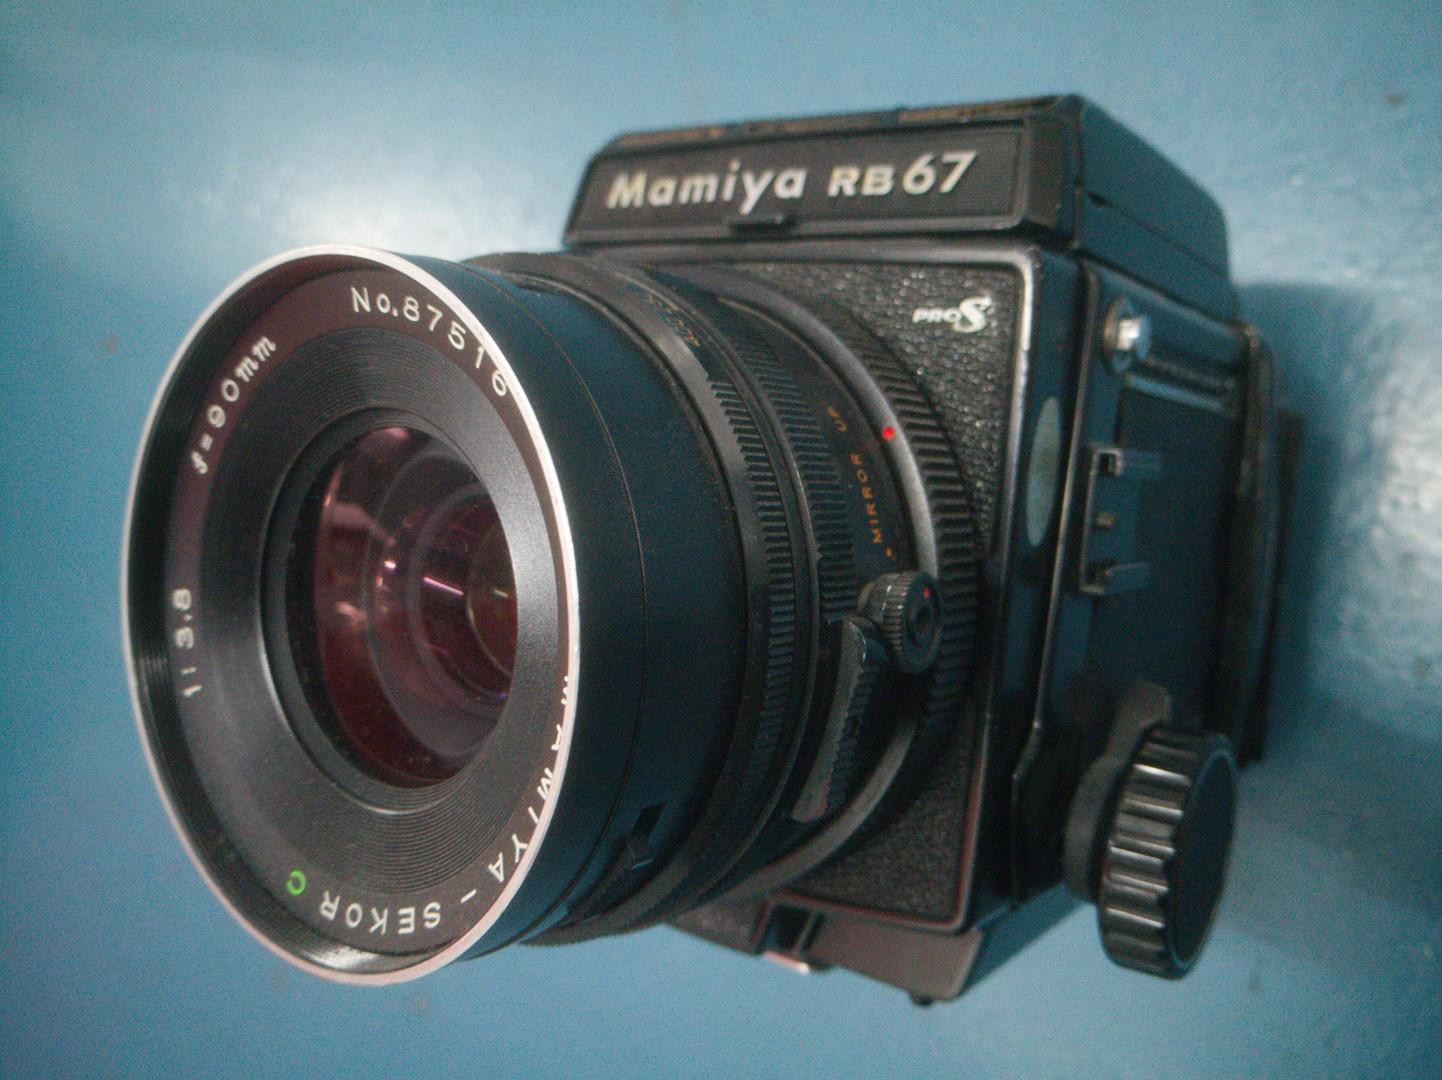 Vintage mamiya rb67 MF with filmbacking (7/10)